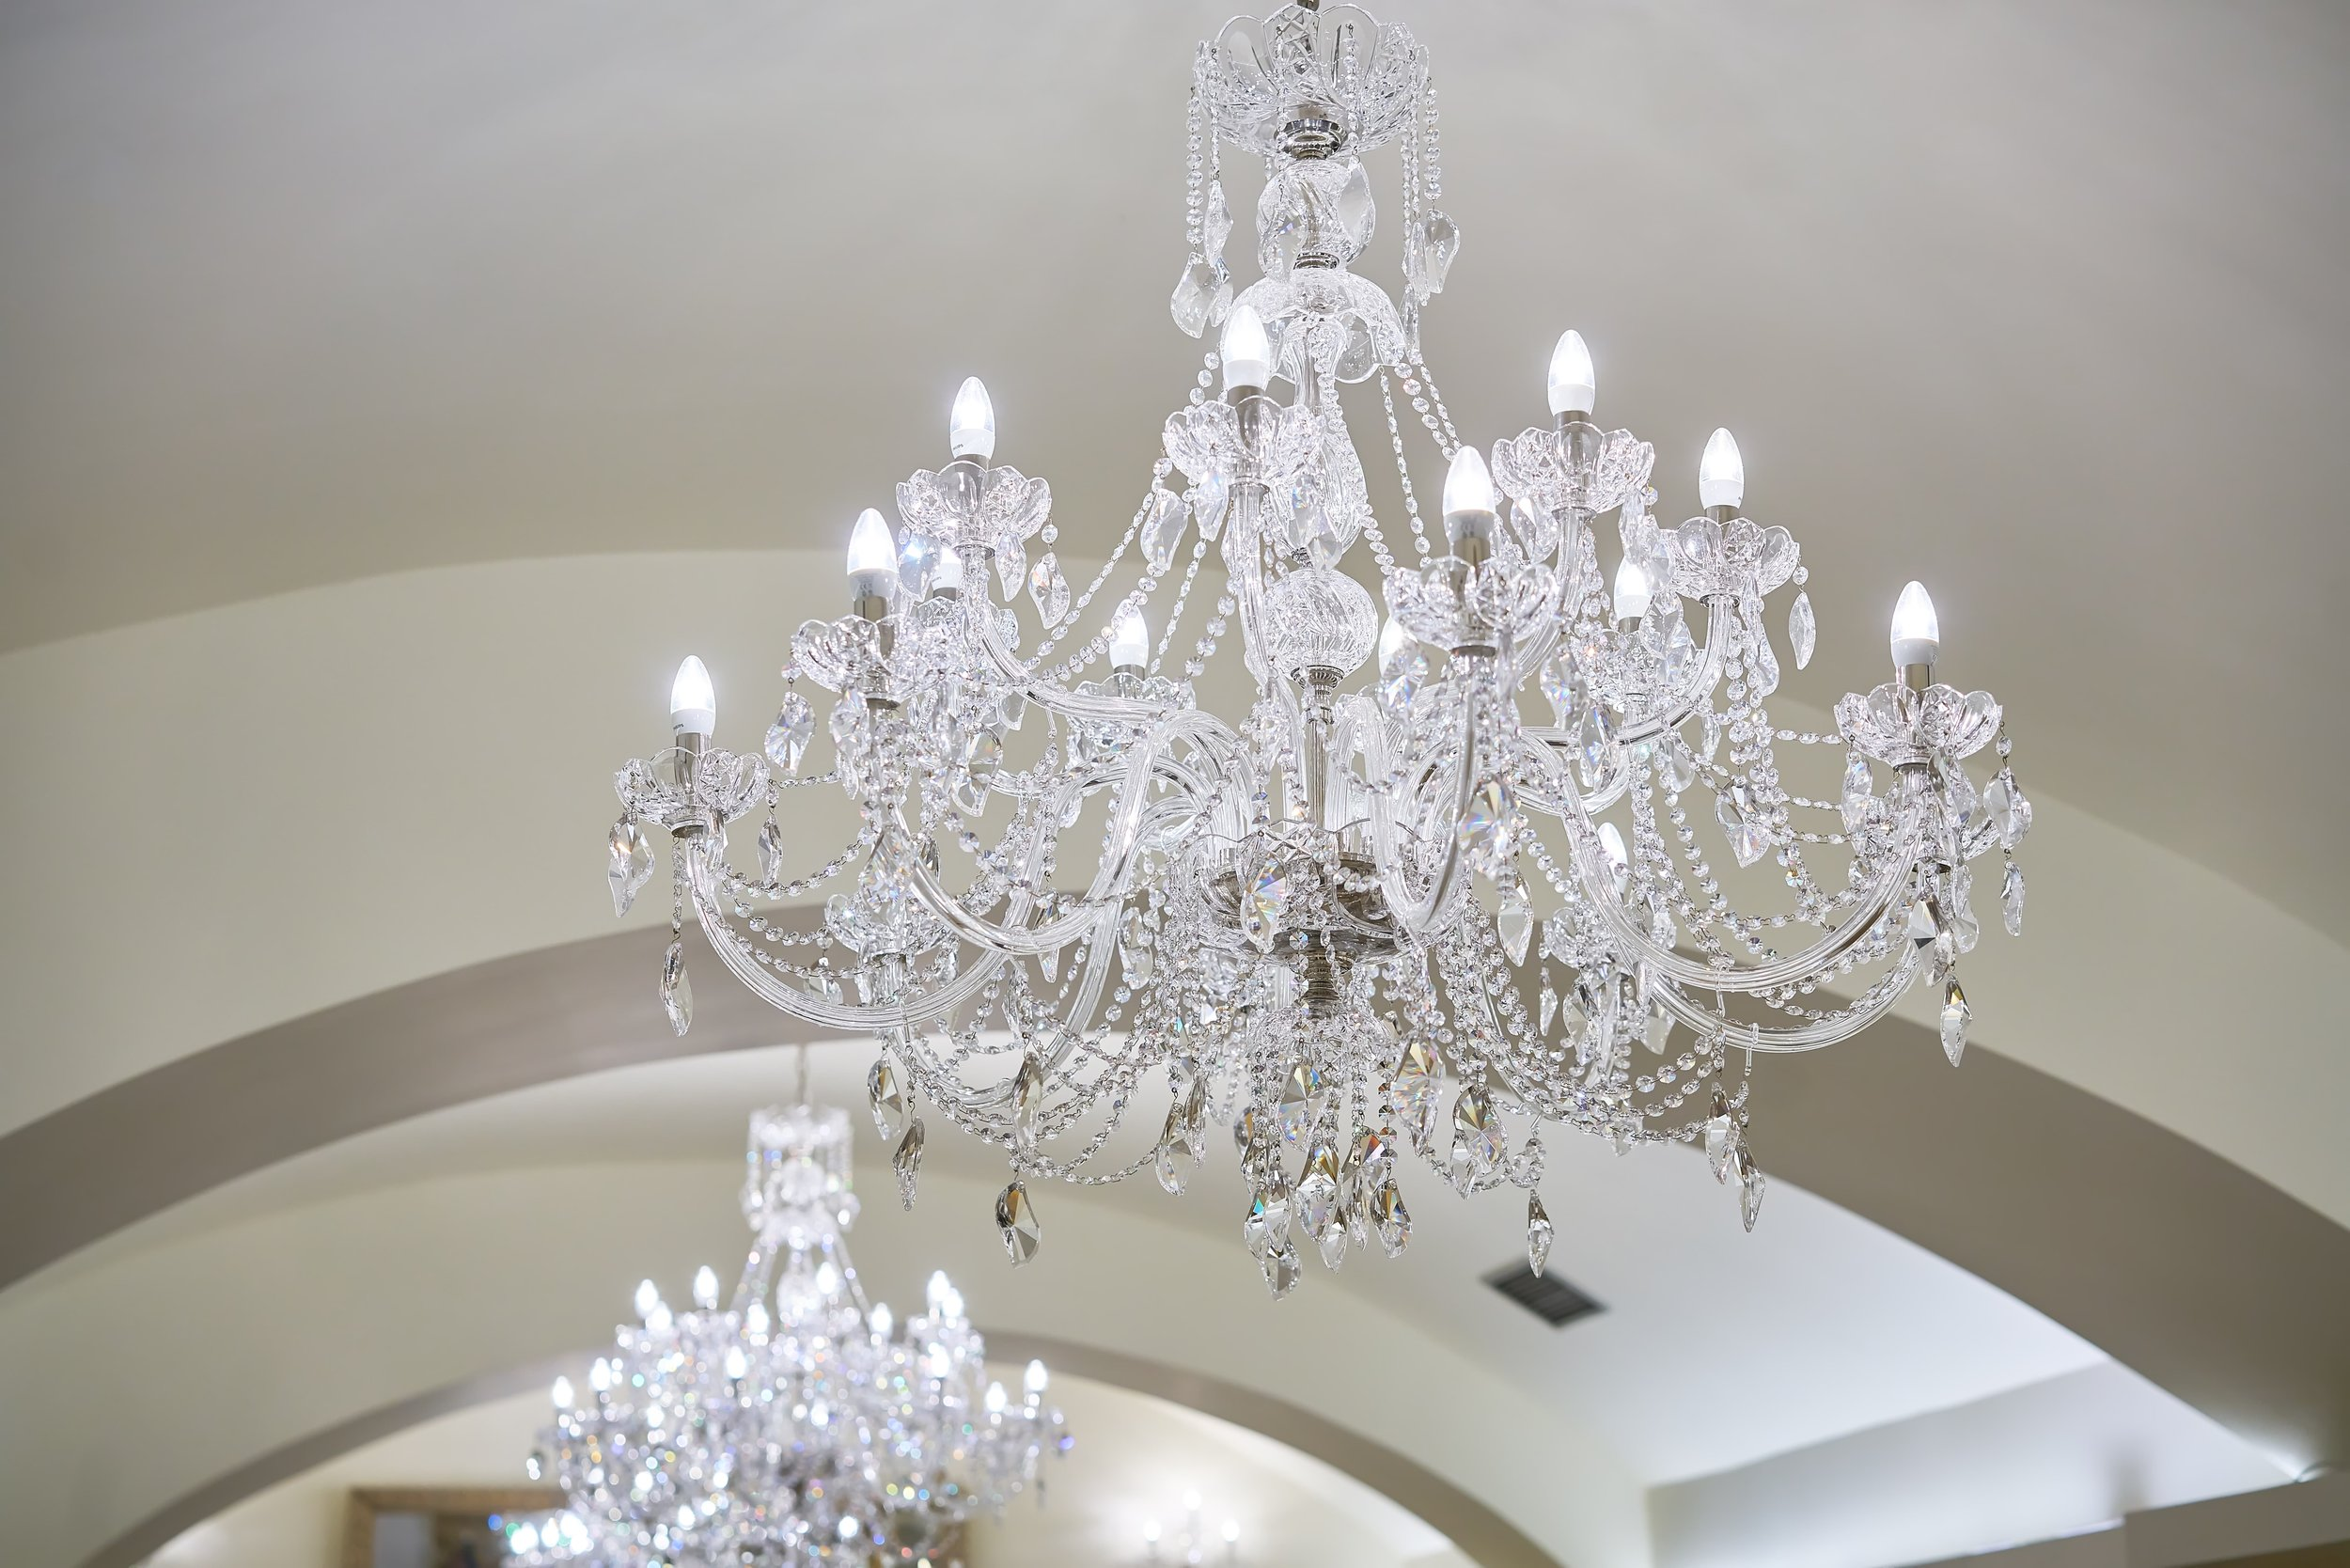 Hotel-King-David-Wranovsky-Crystal-Chandelier-2.jpg